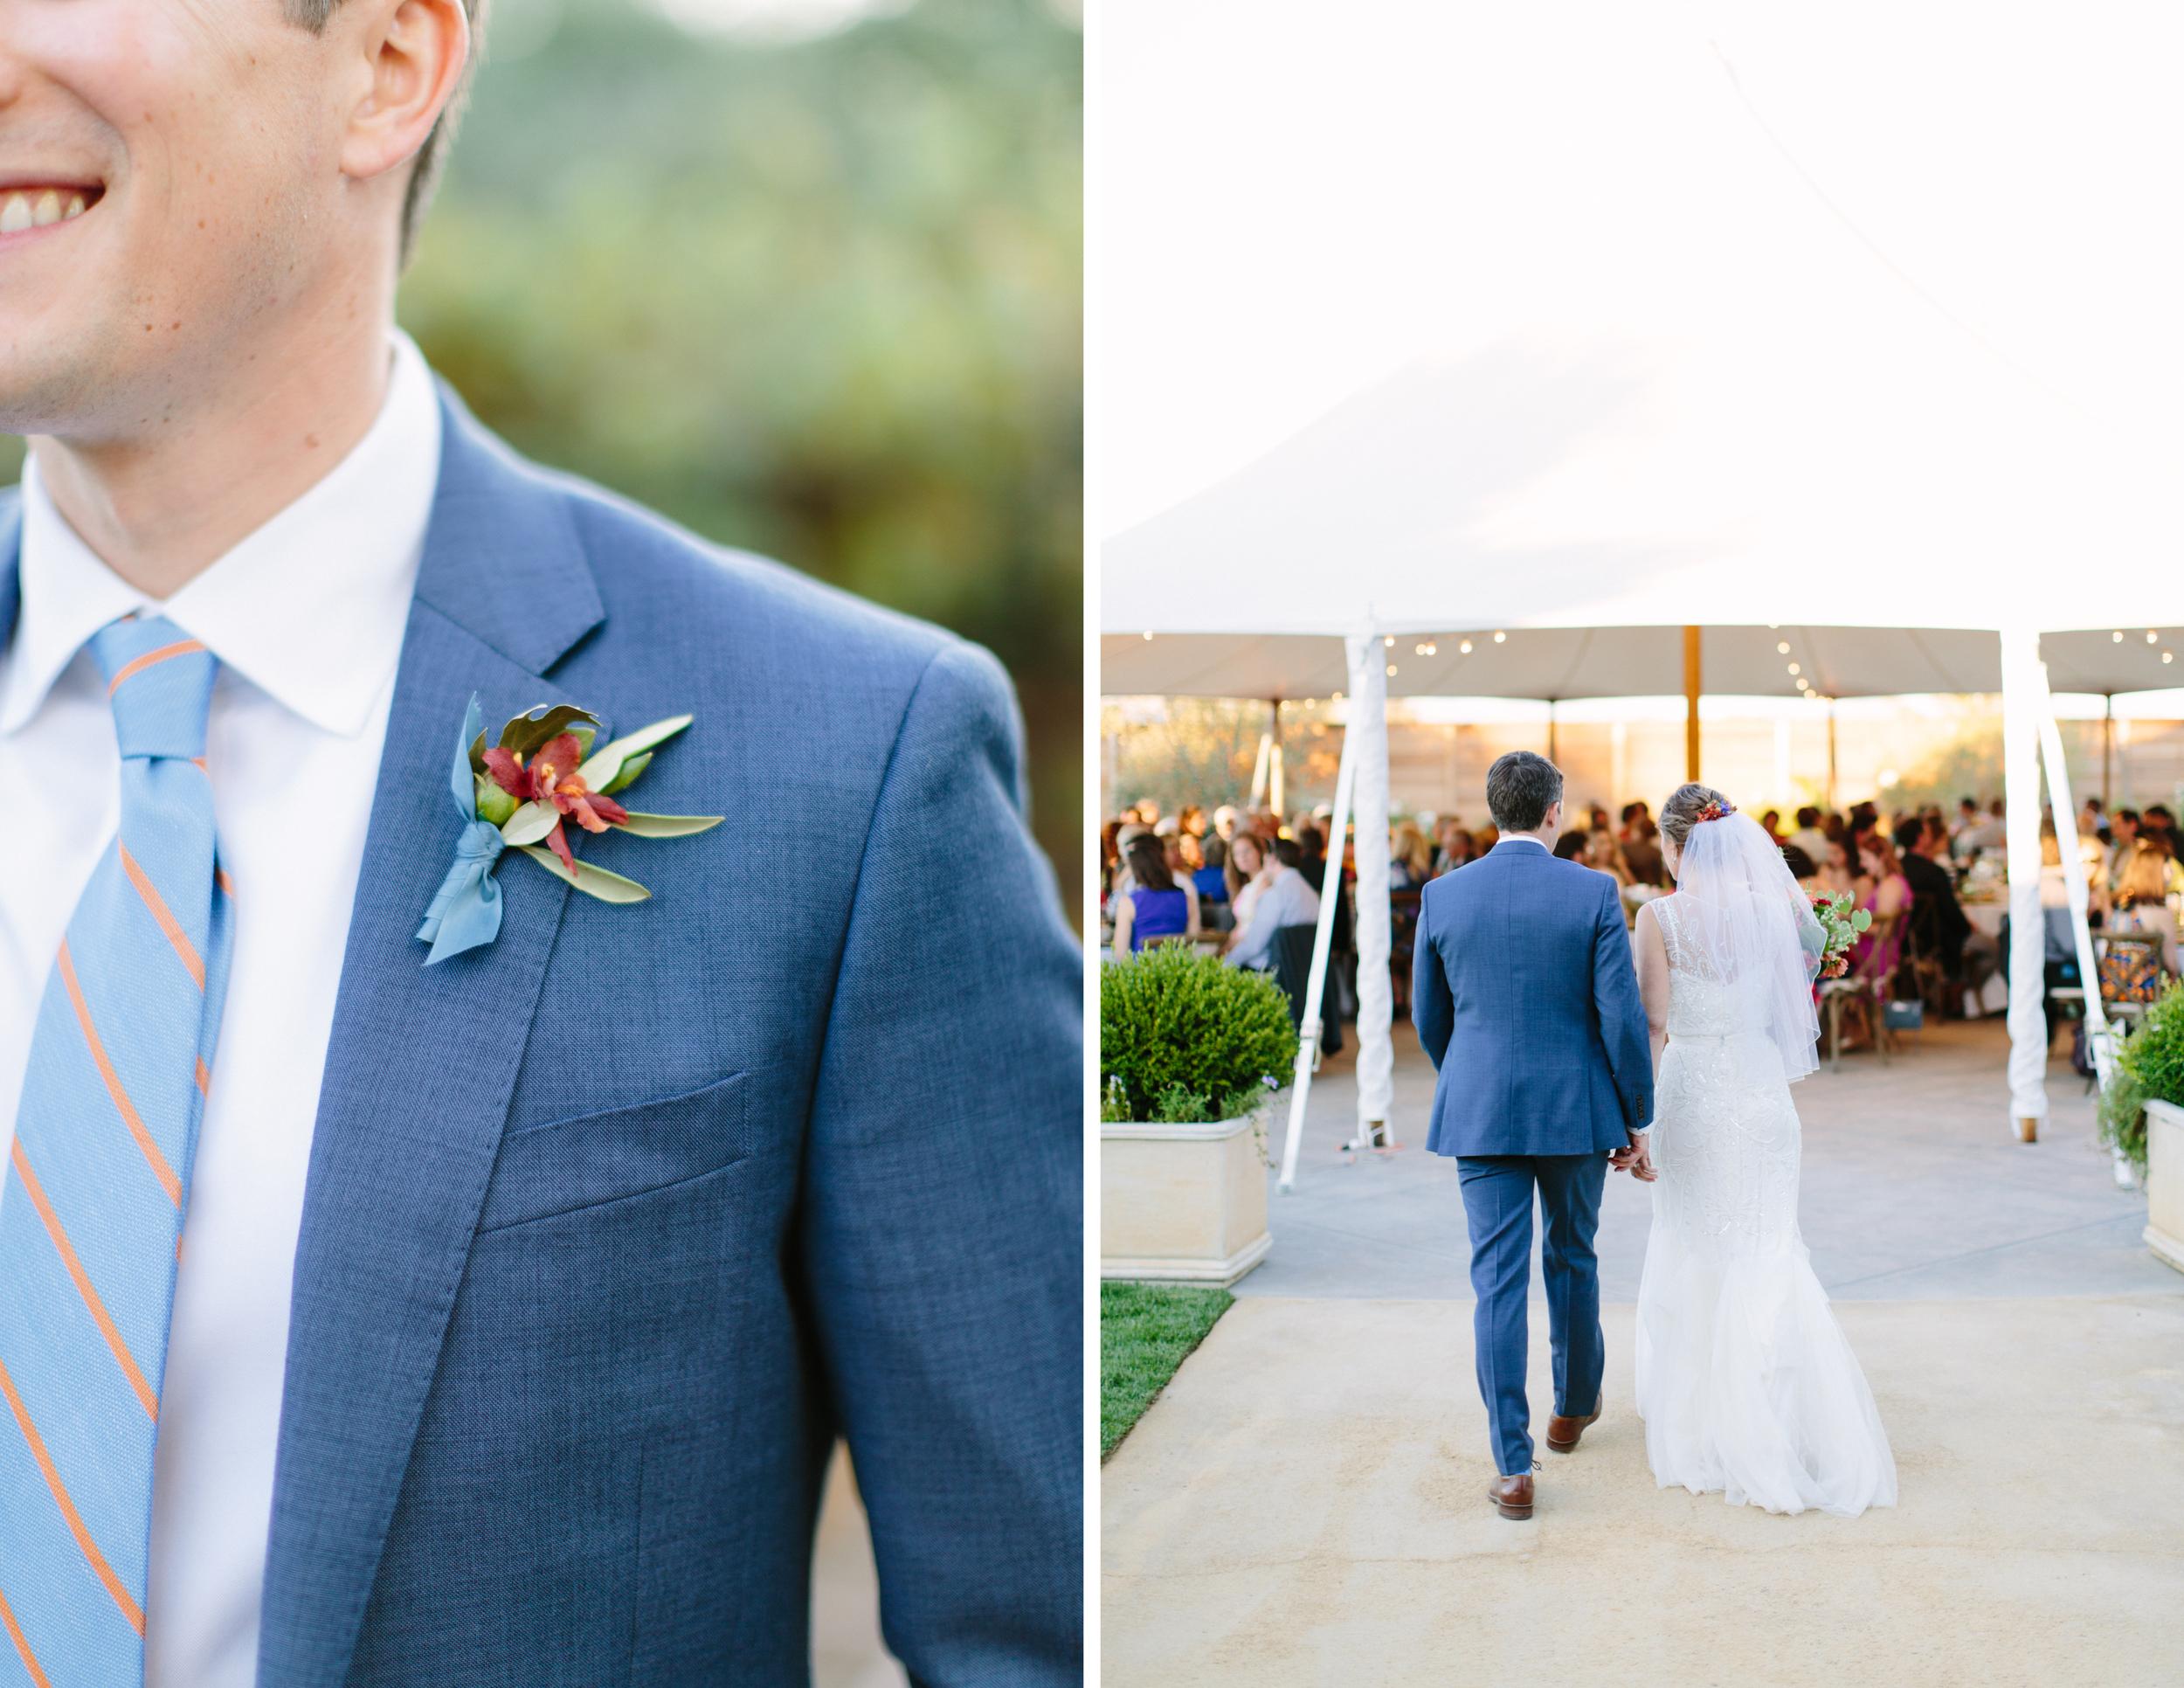 cornerstone sonoma wedding 15.jpg